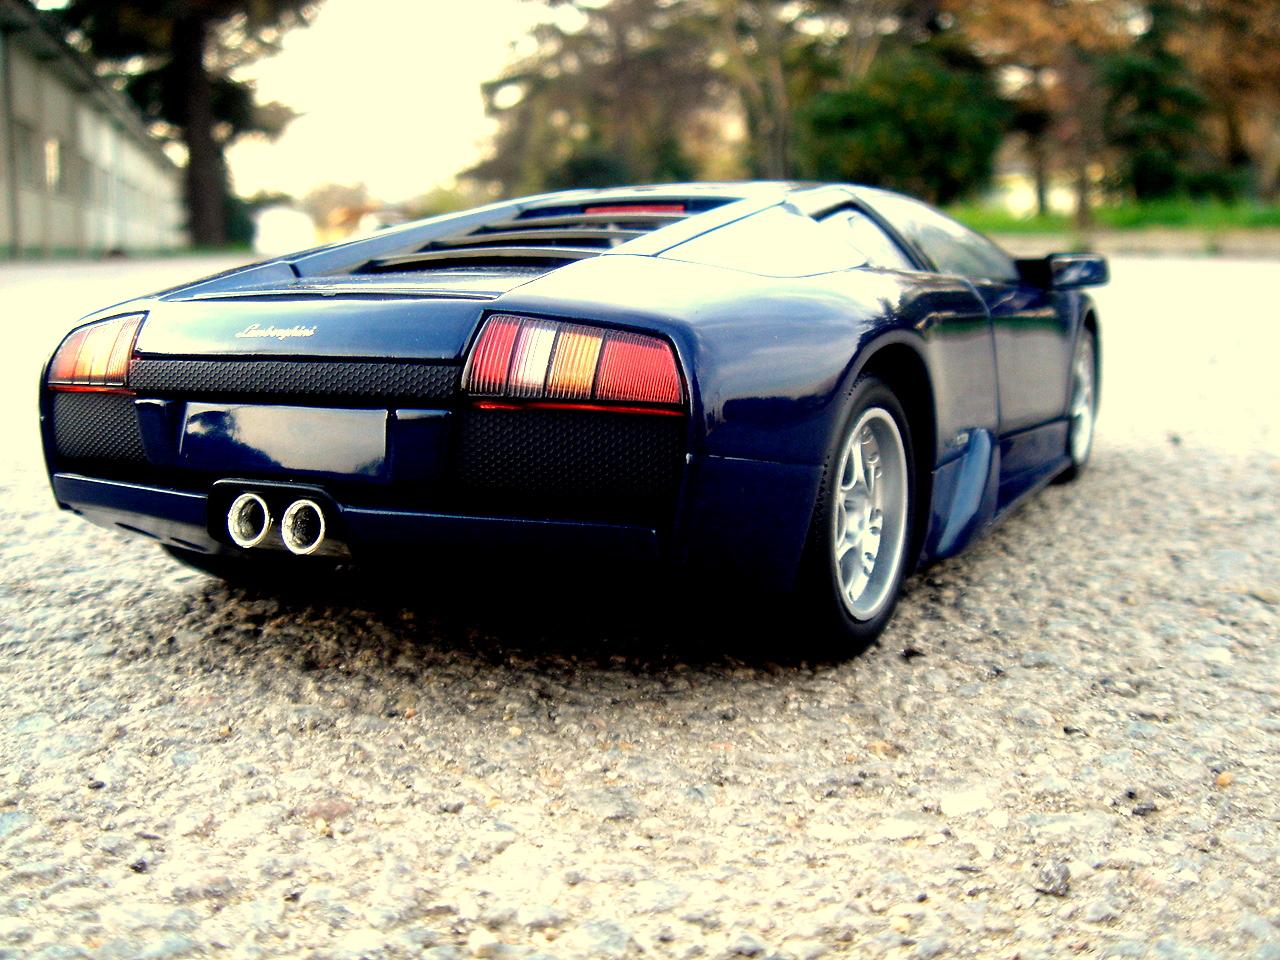 Lamborghini Murcielago by vudin